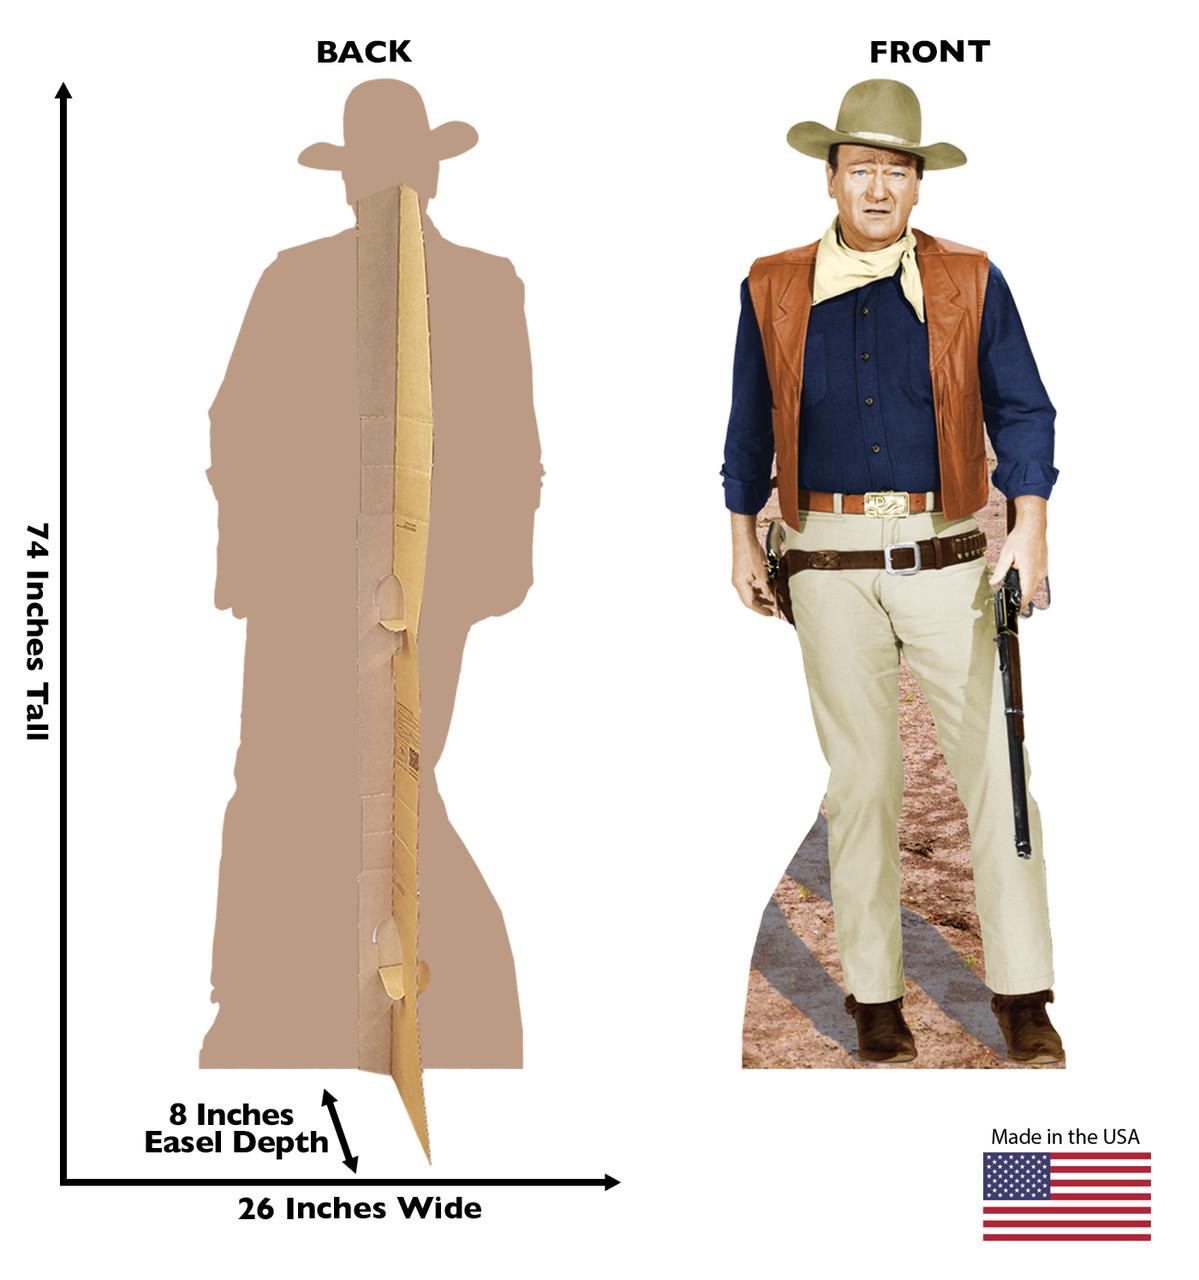 John Wayne-Rifle at Side - Cardboard Cutout 495